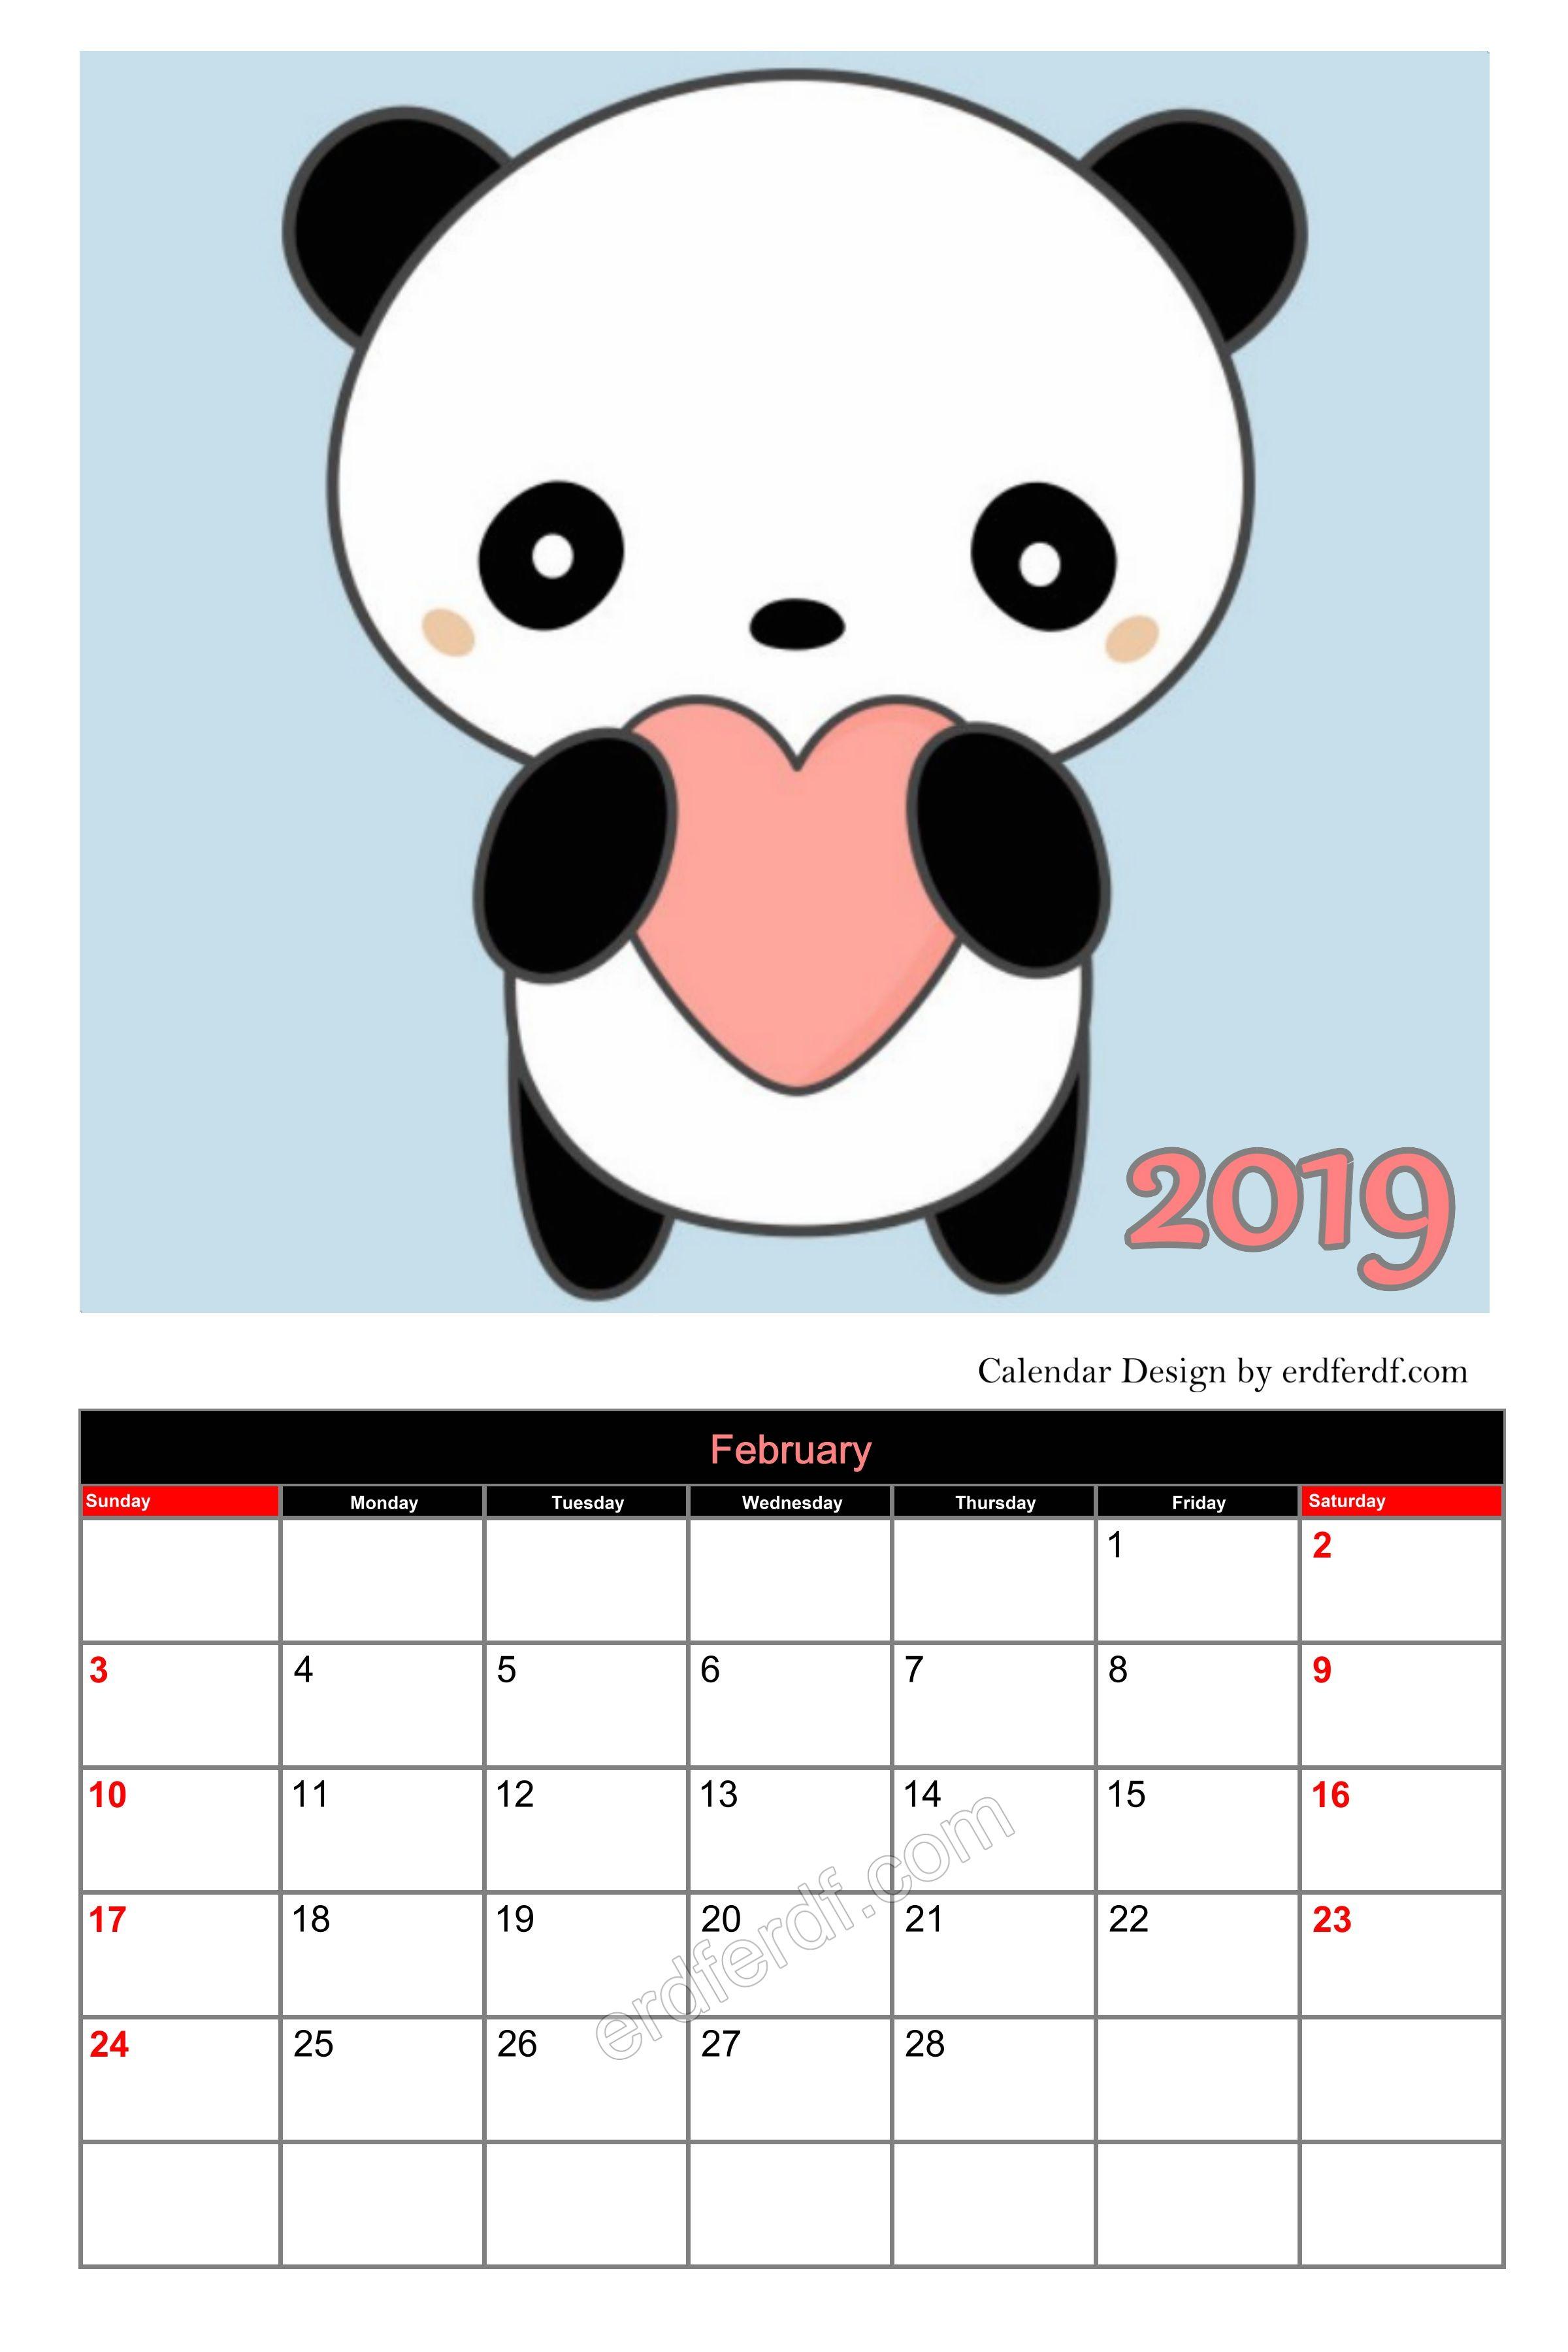 Elementary School February Calendar 2019 Blank Panda Cute Editable Calendar 2019 February Cute Free Download